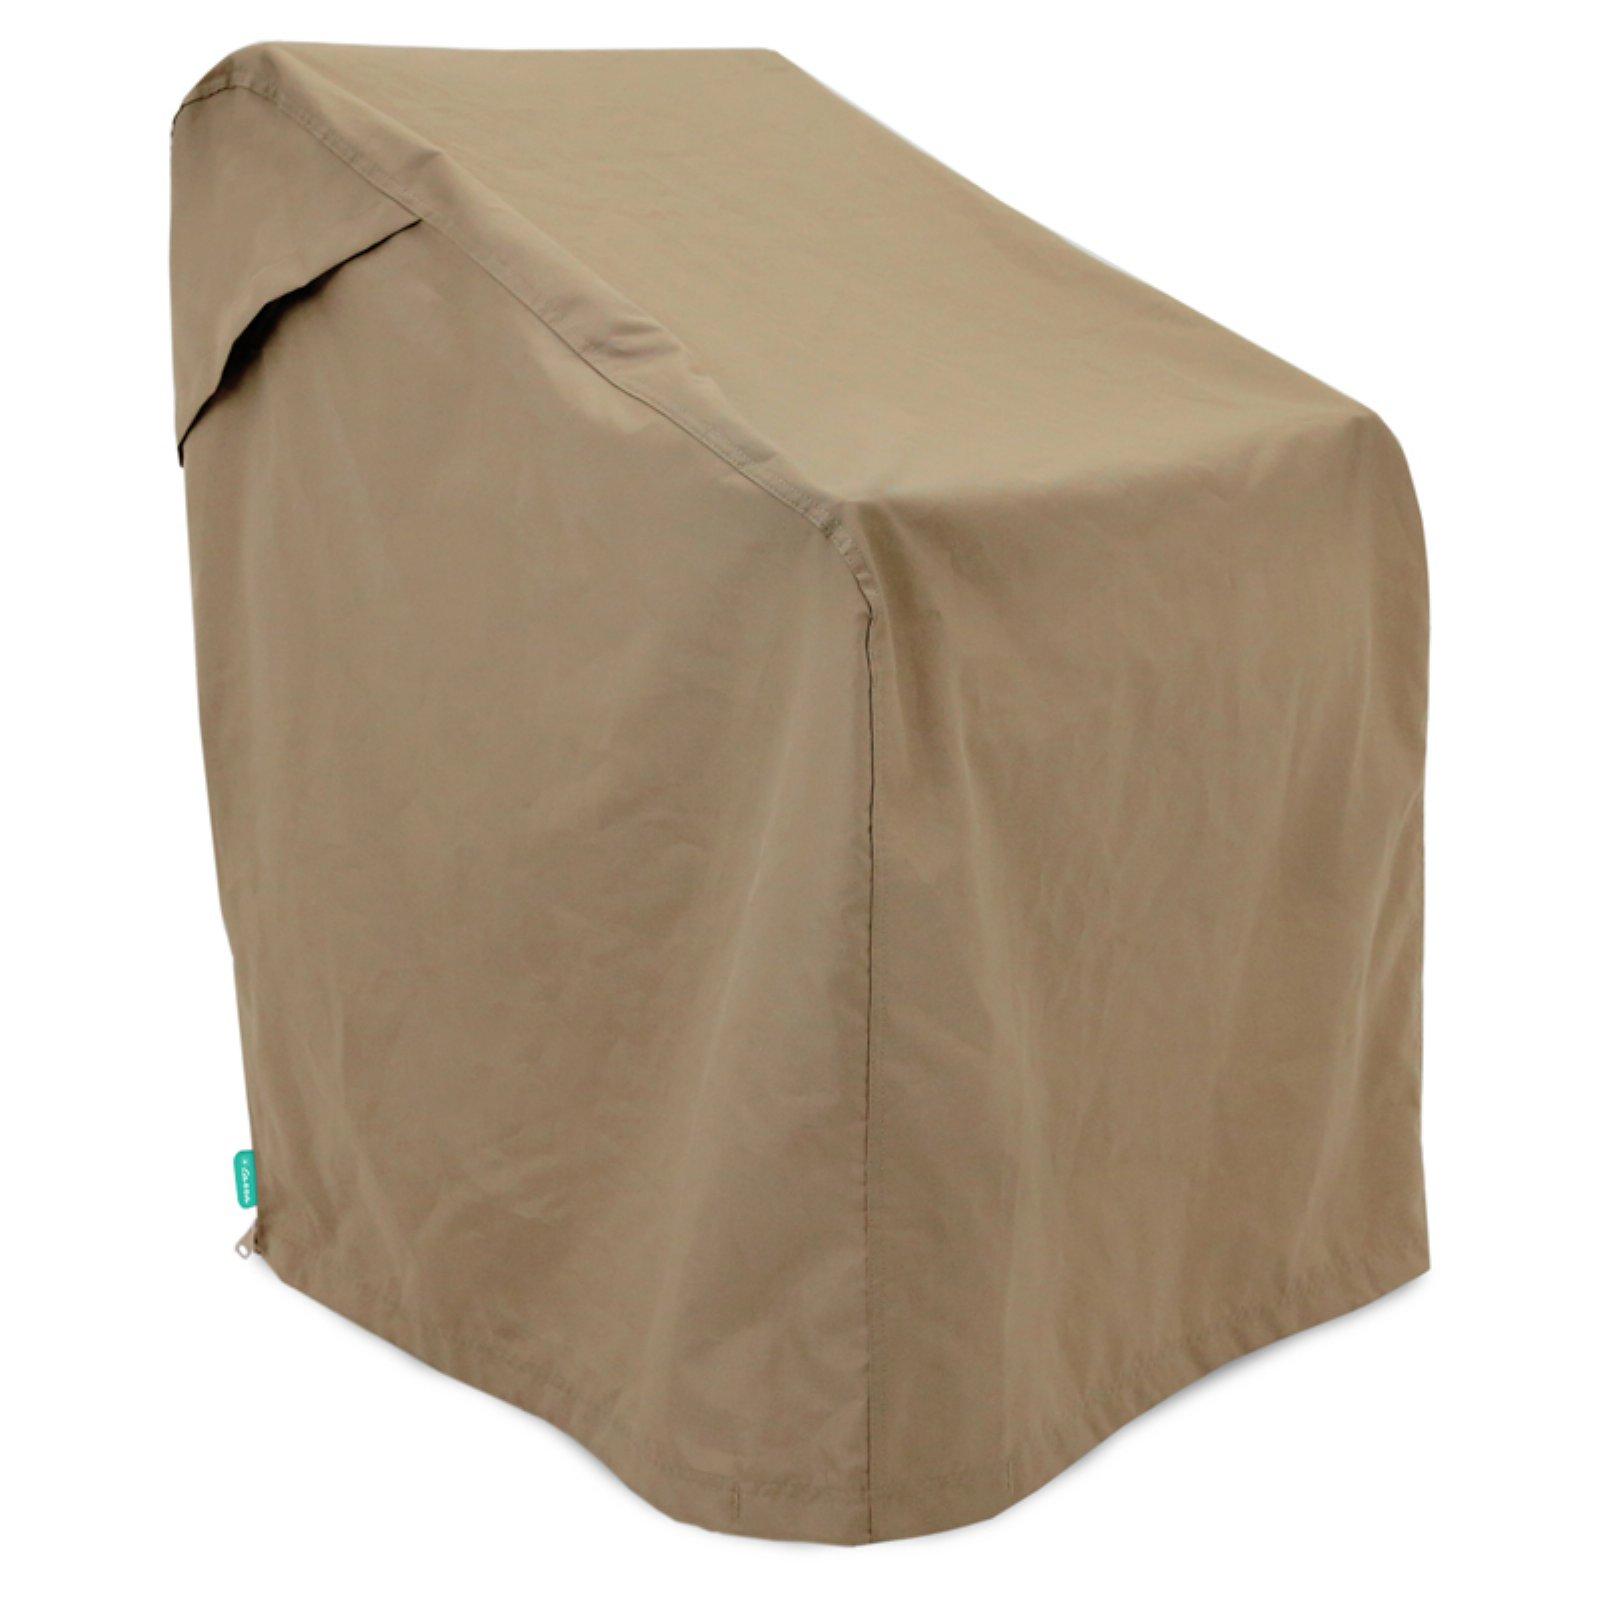 Tarra Home Universal Outdoor UFCCP302633PT Patio Chair Cover